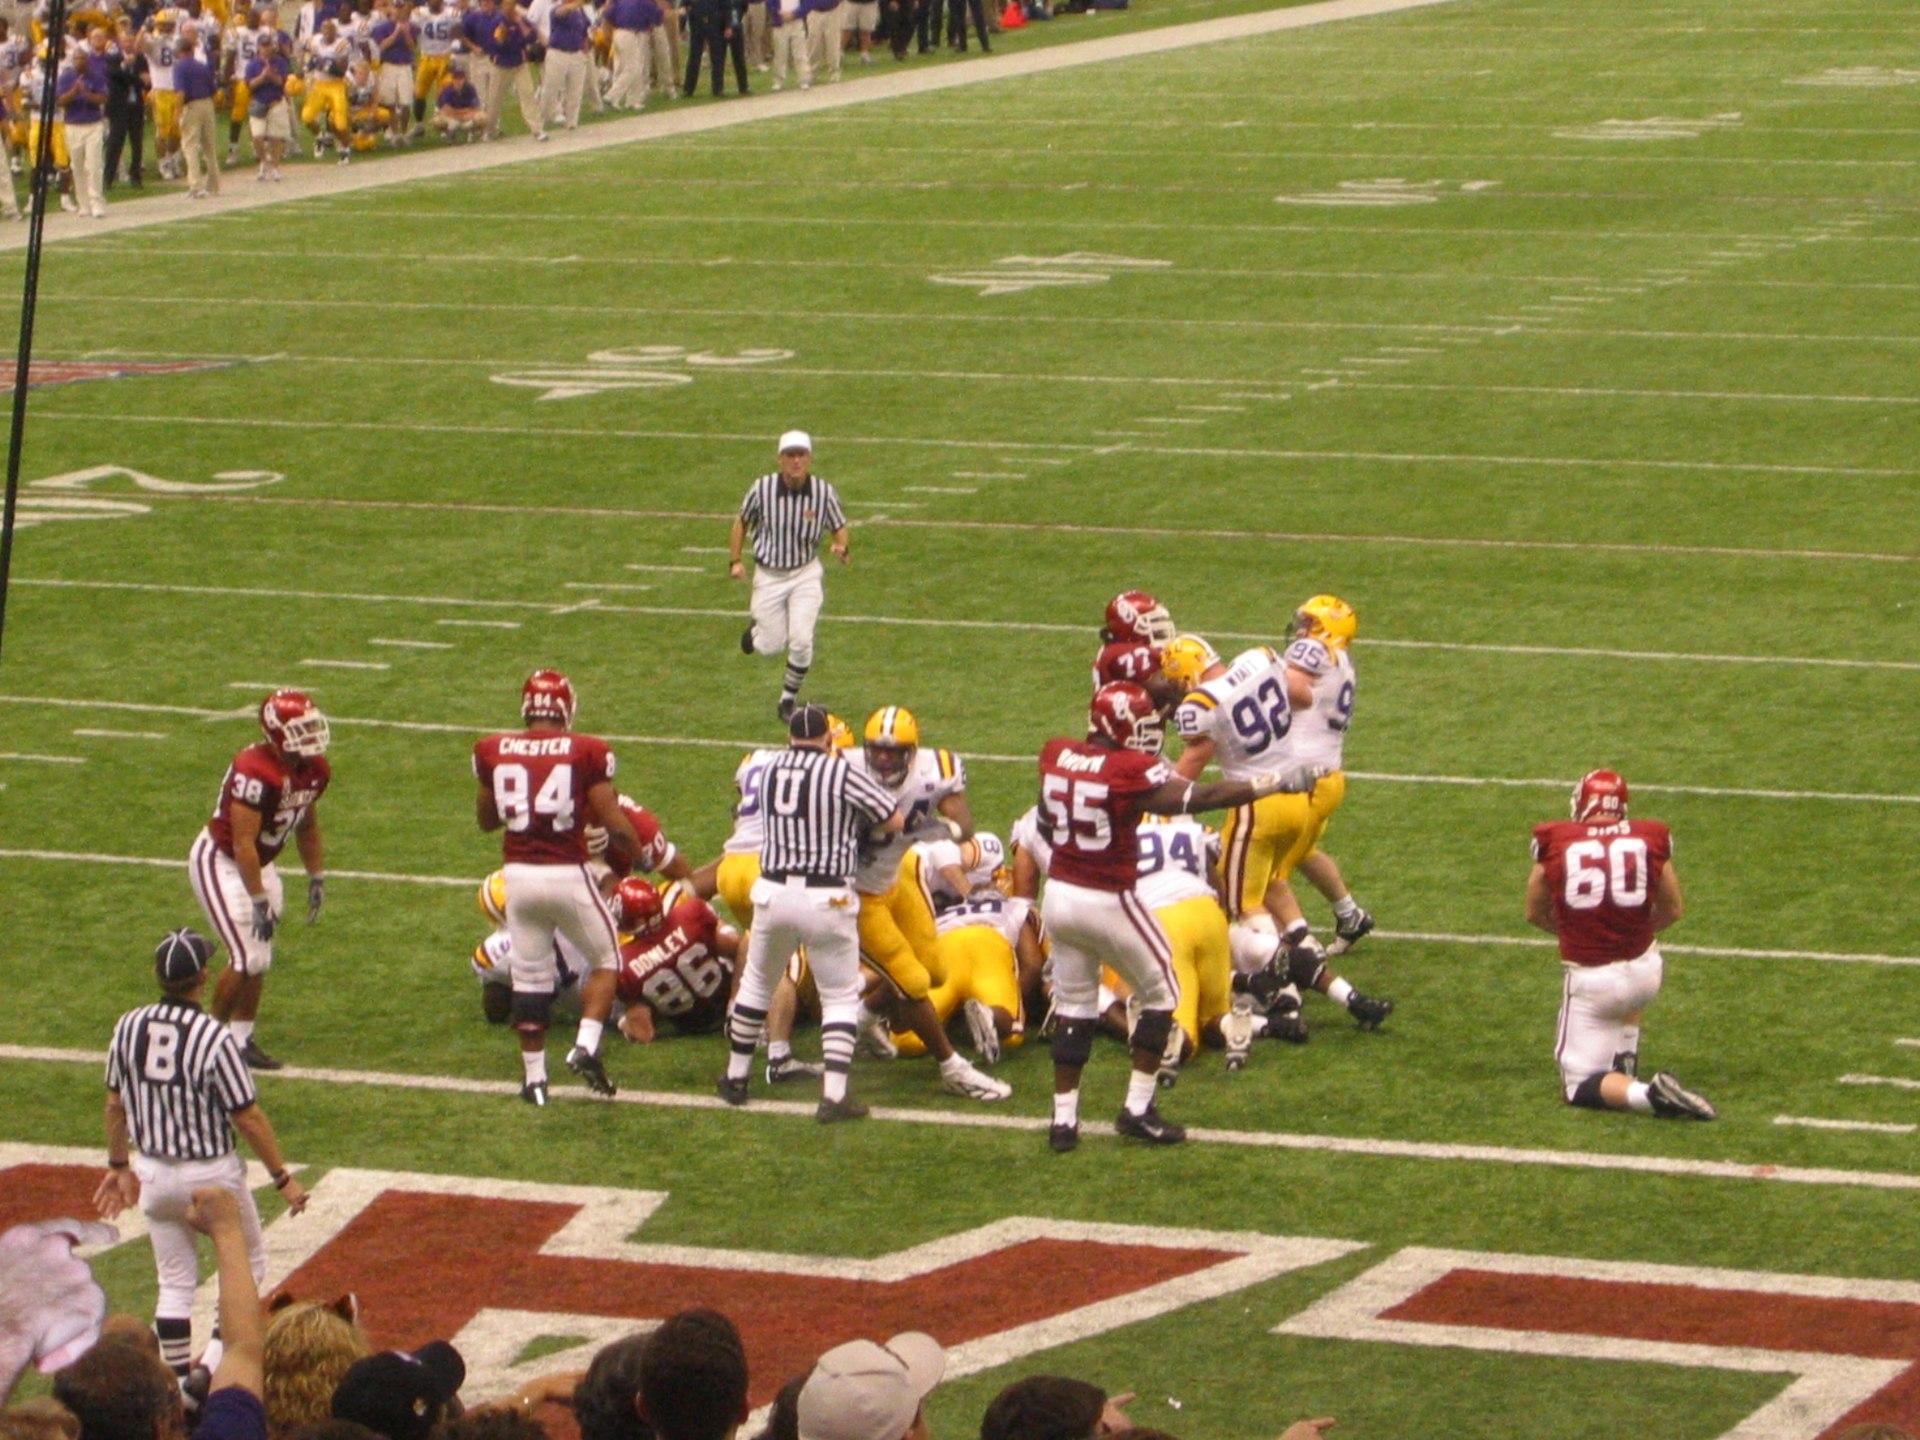 2003 NCAA Division I-A football season - Wikipedia